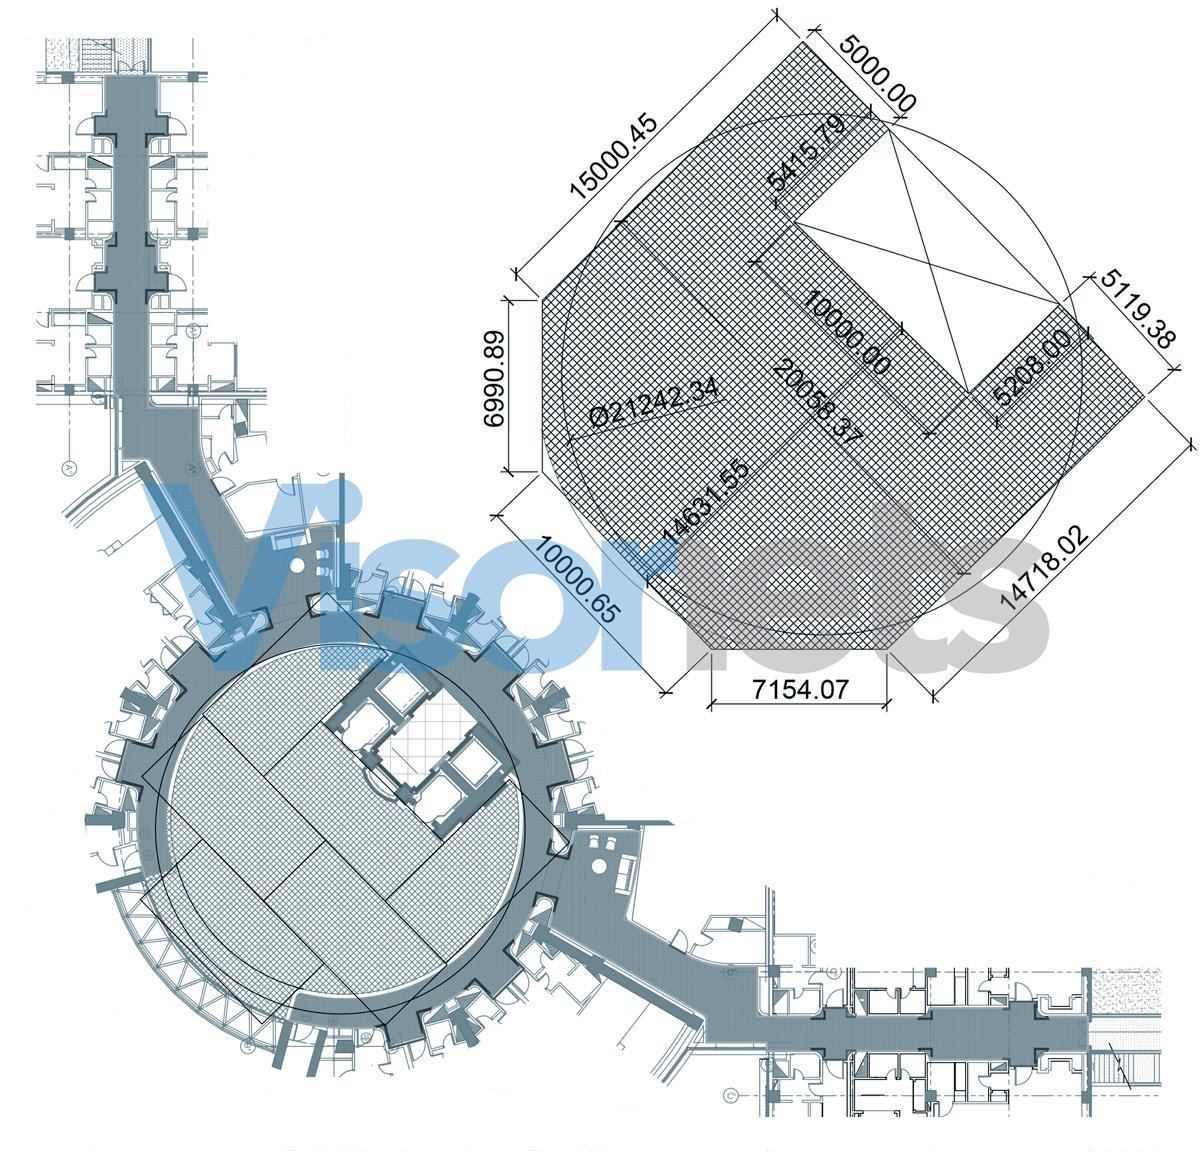 visornets-hyatt-hotel-sicherheitsnetz-typ-s-plan-2c